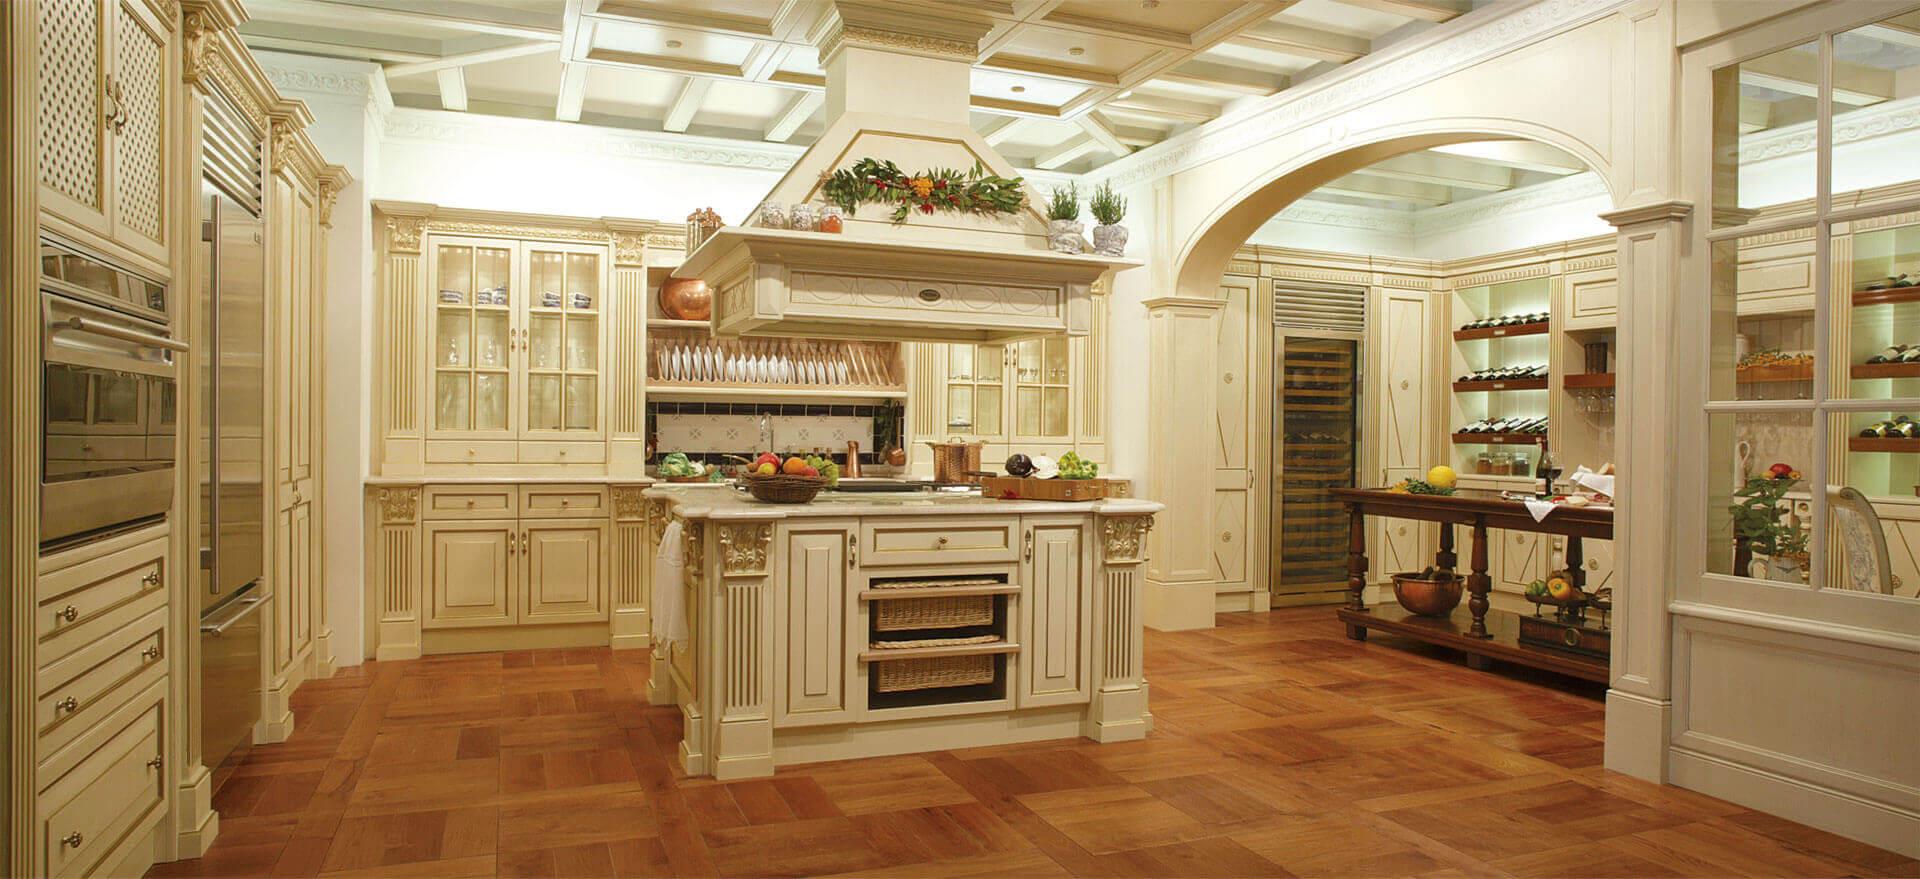 luxury classic kitchen design